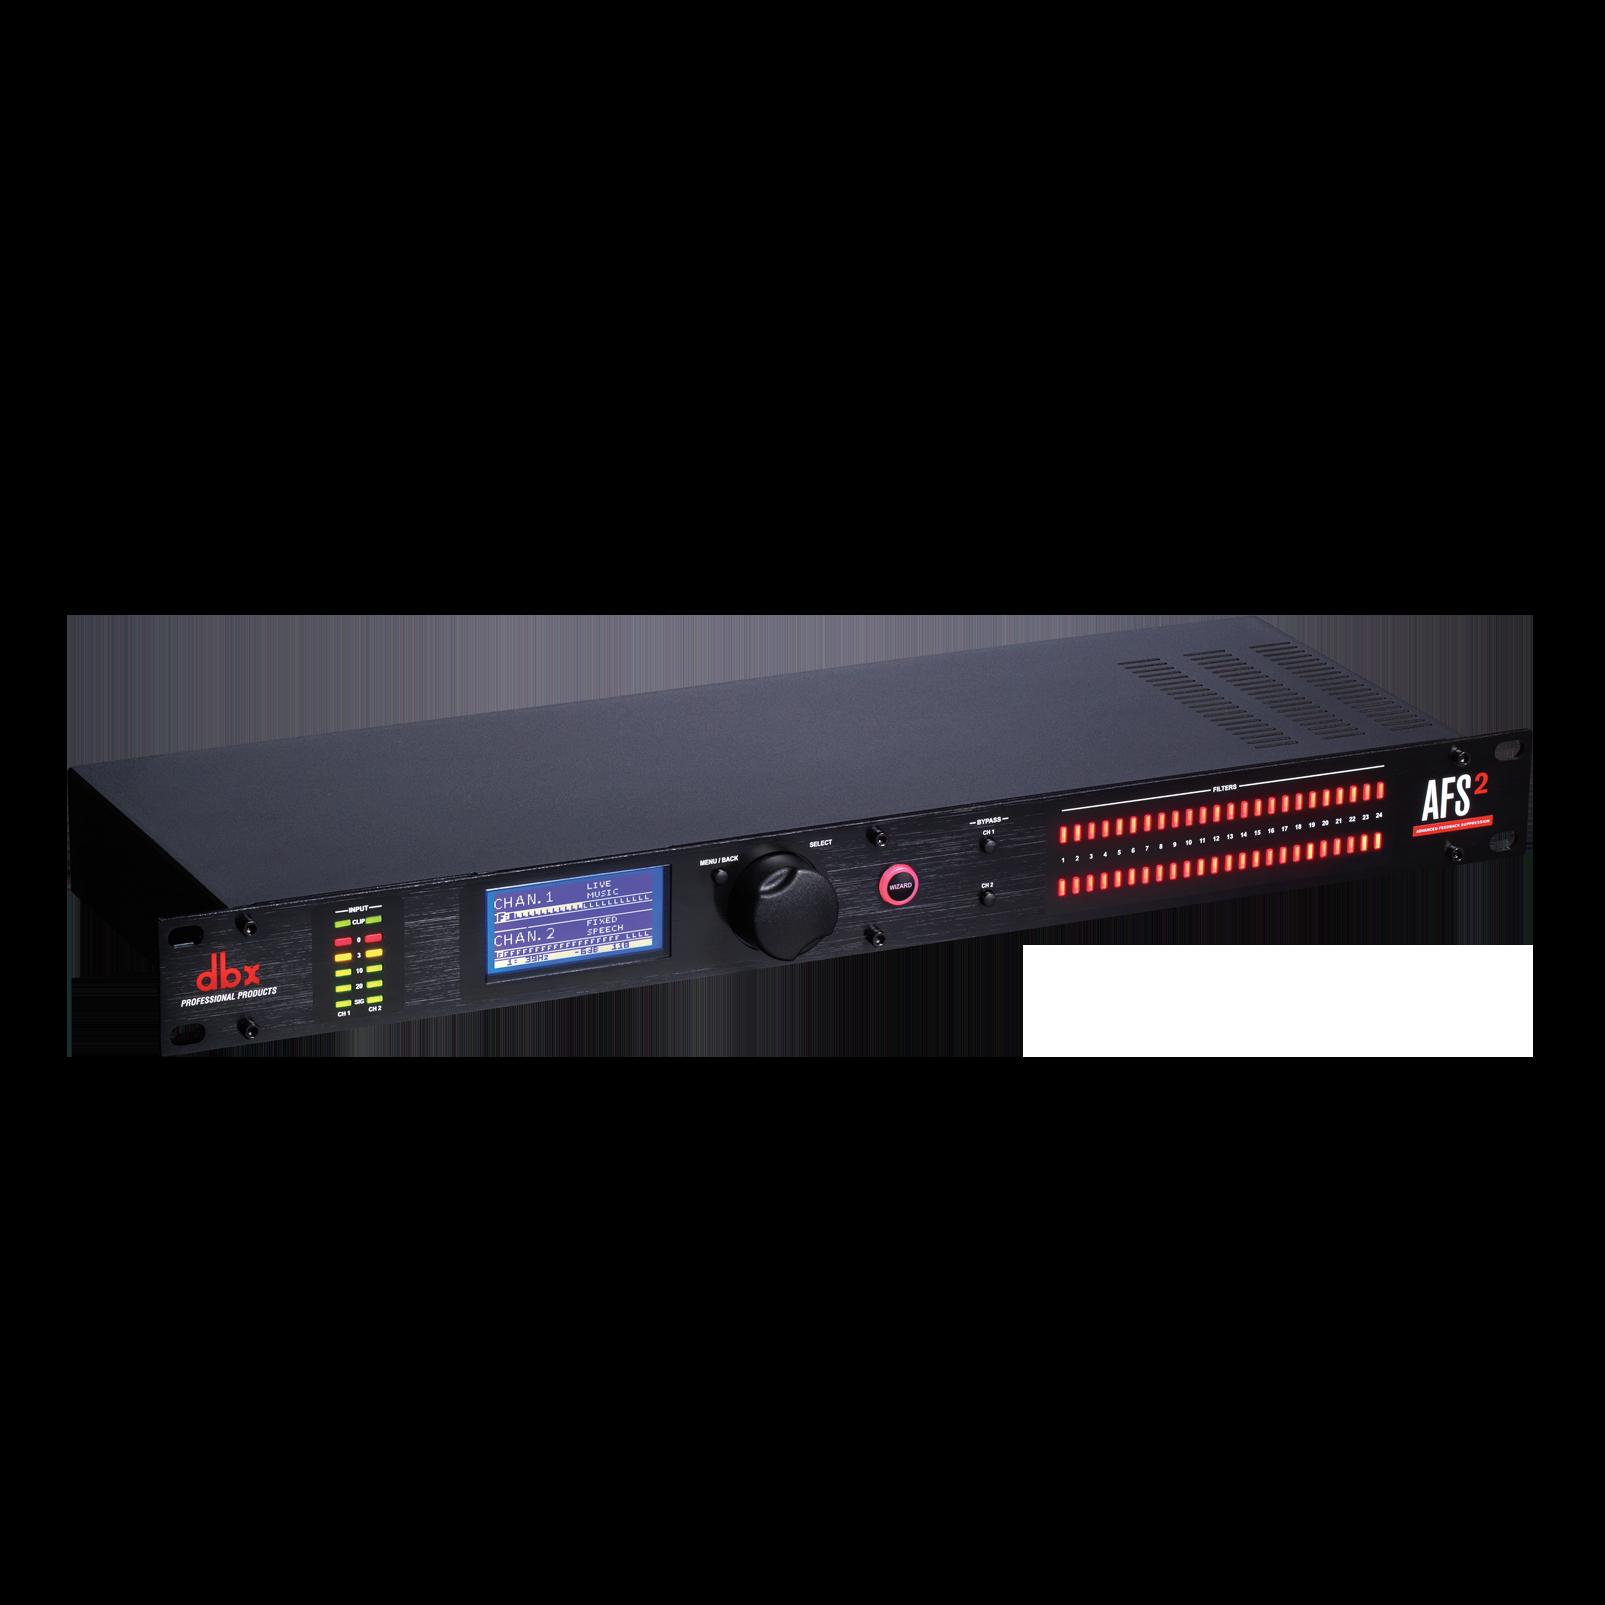 AFS2 - Black - Advanced Feedback Suppression® Processor with Full LCD Display - Hero